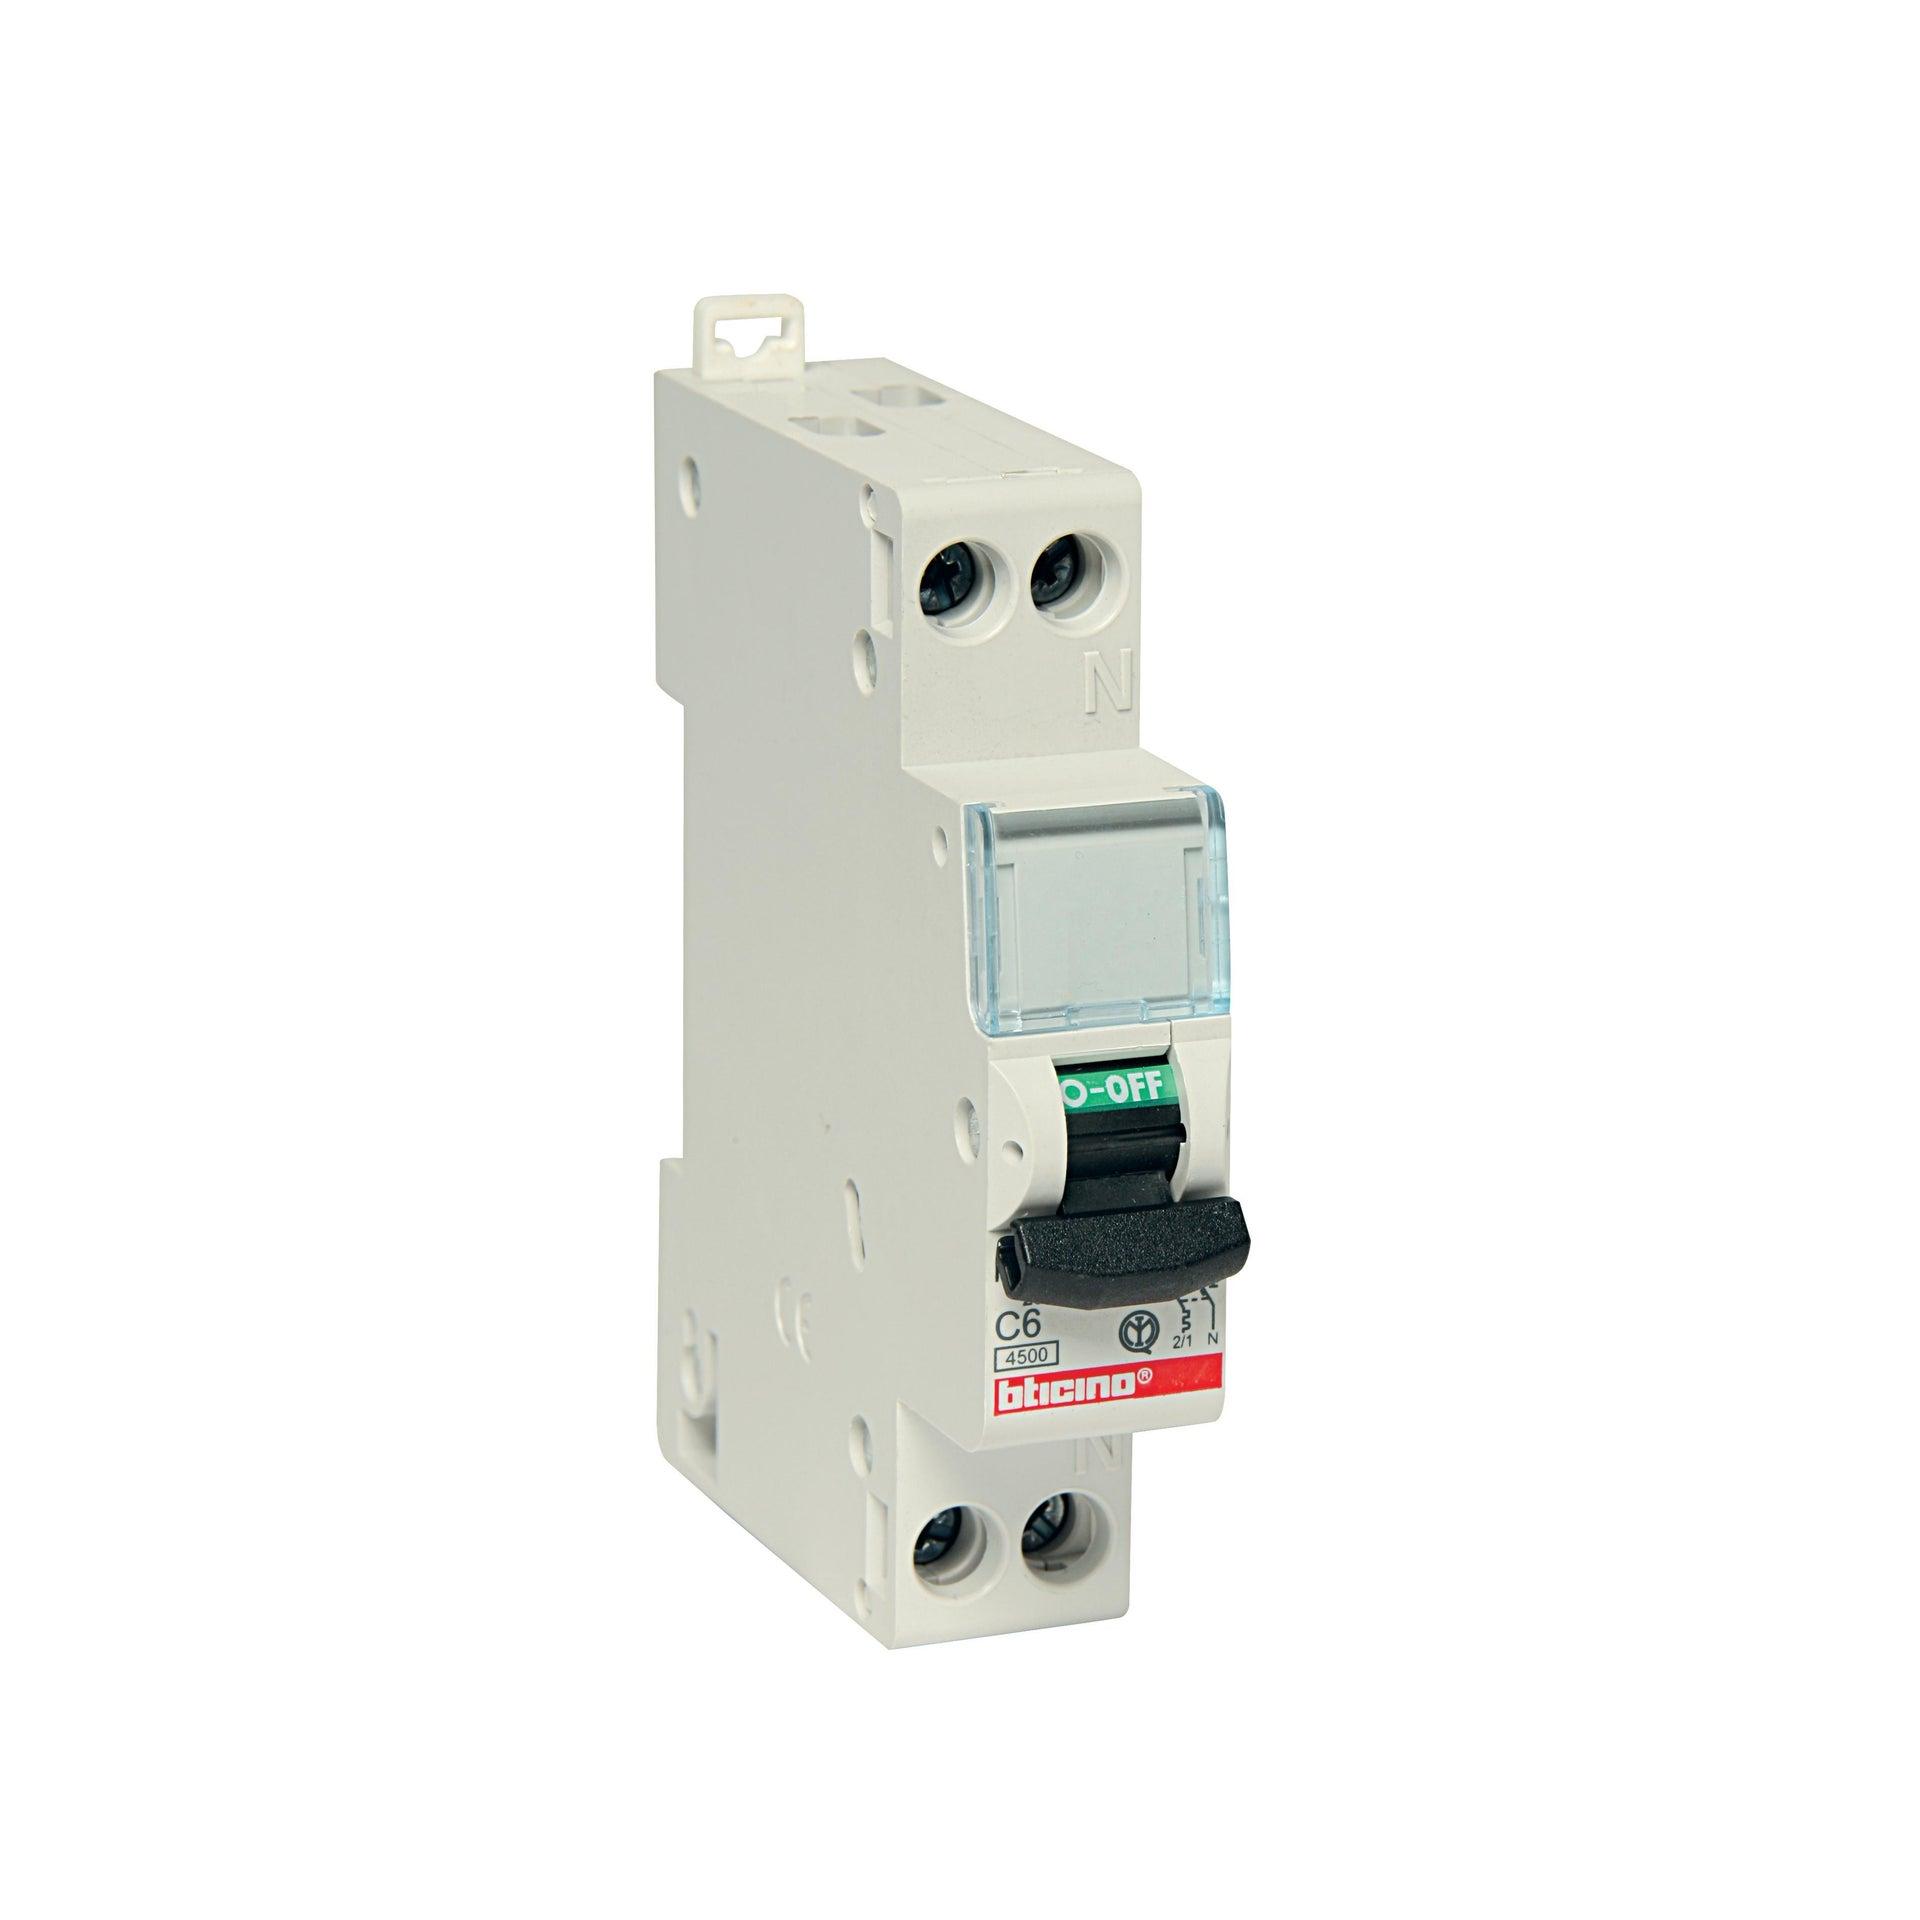 Interruttore magnetotermico BTICINO FC881C16 1P +N 16A C 1 modulo 230V